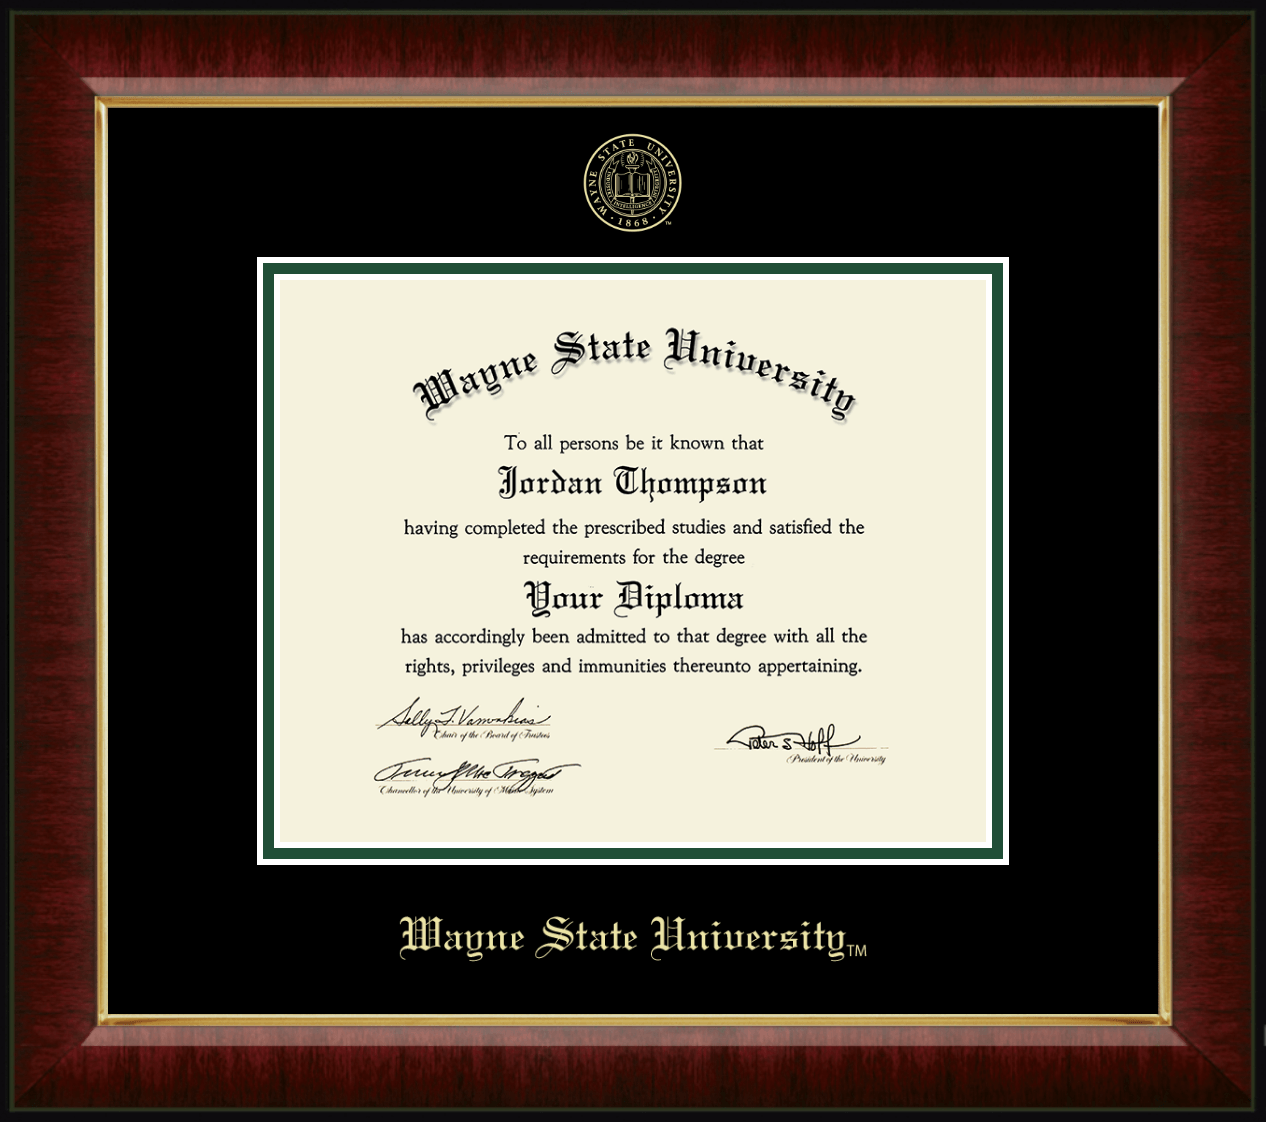 Wayne State University Gold Embossed Diploma Frame In Murano Item 248588 From Wayne State University